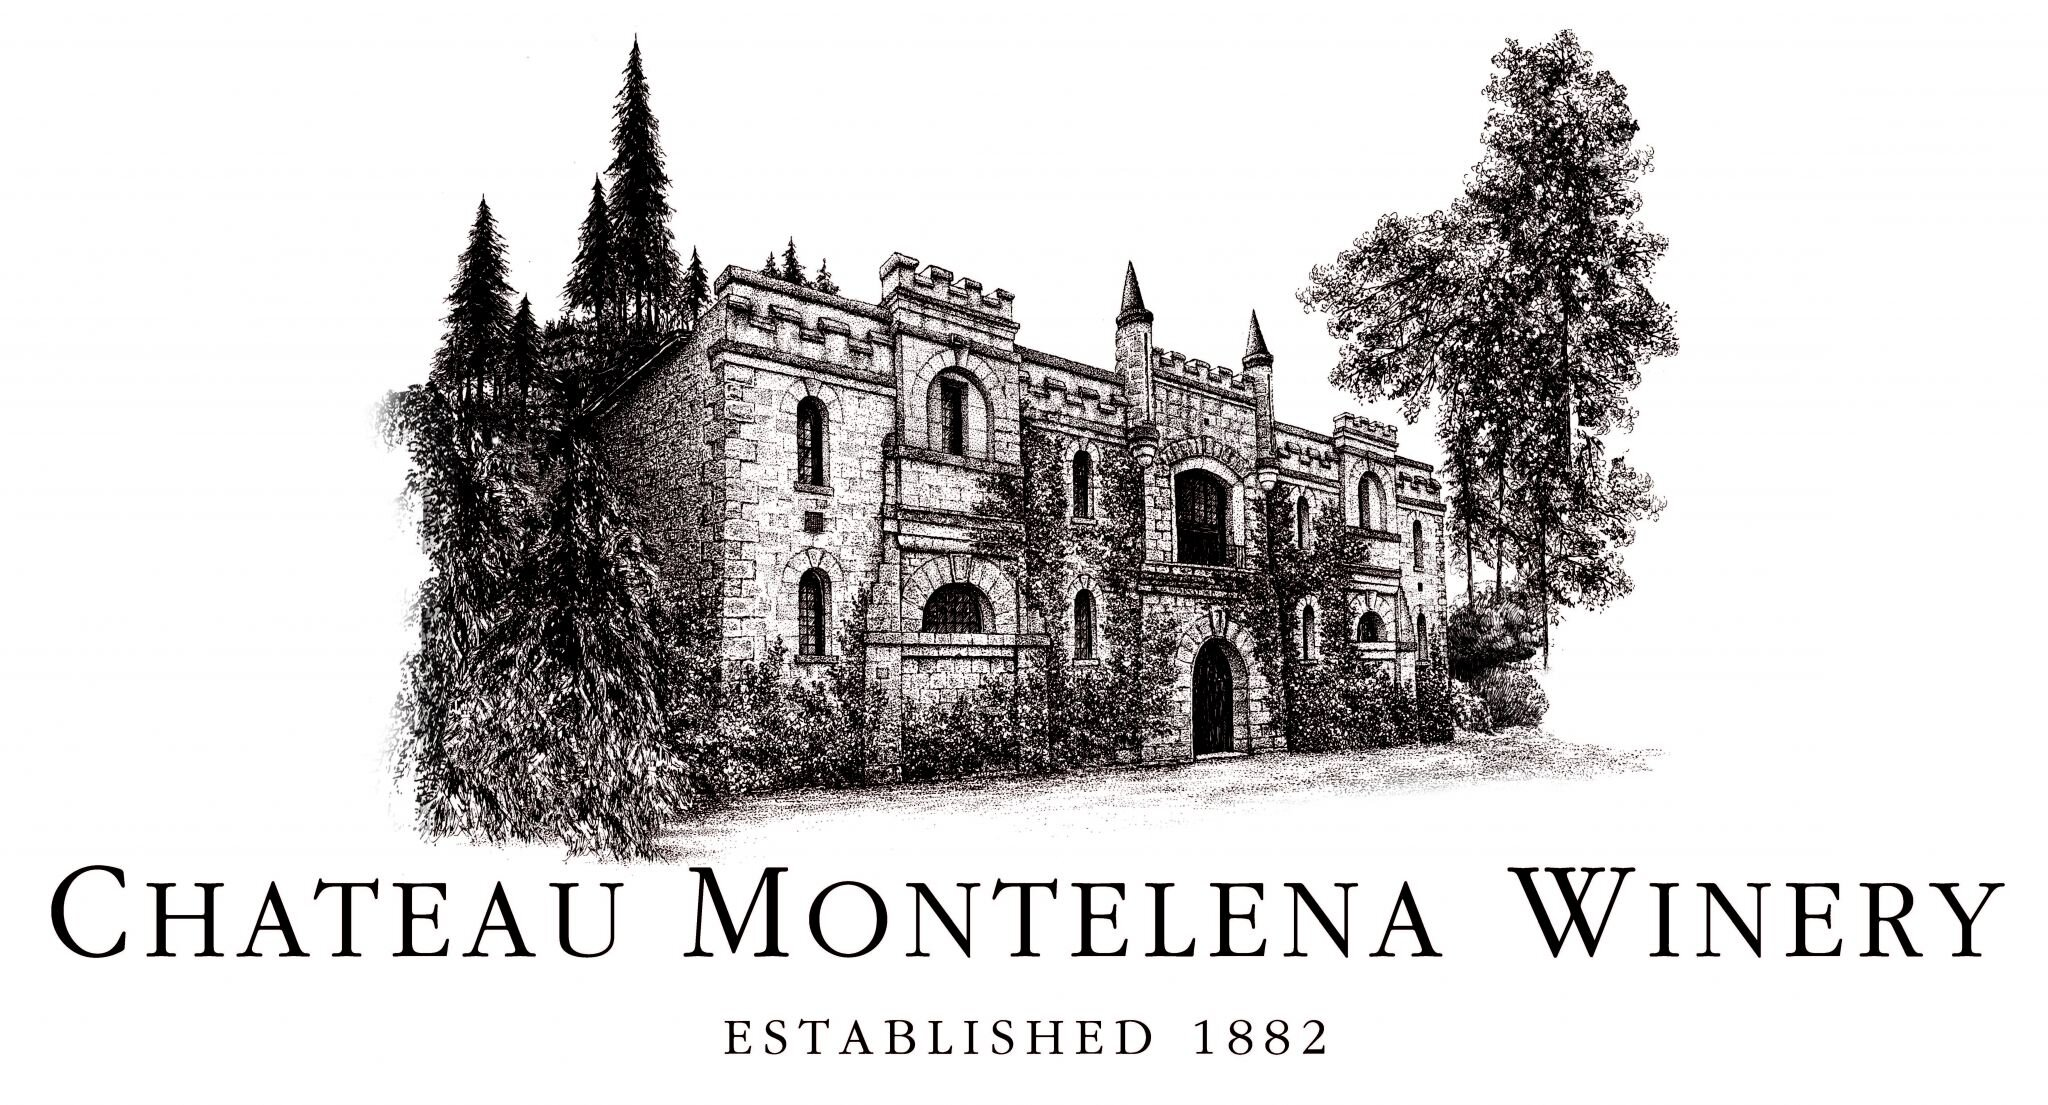 chateau montelena.jpg